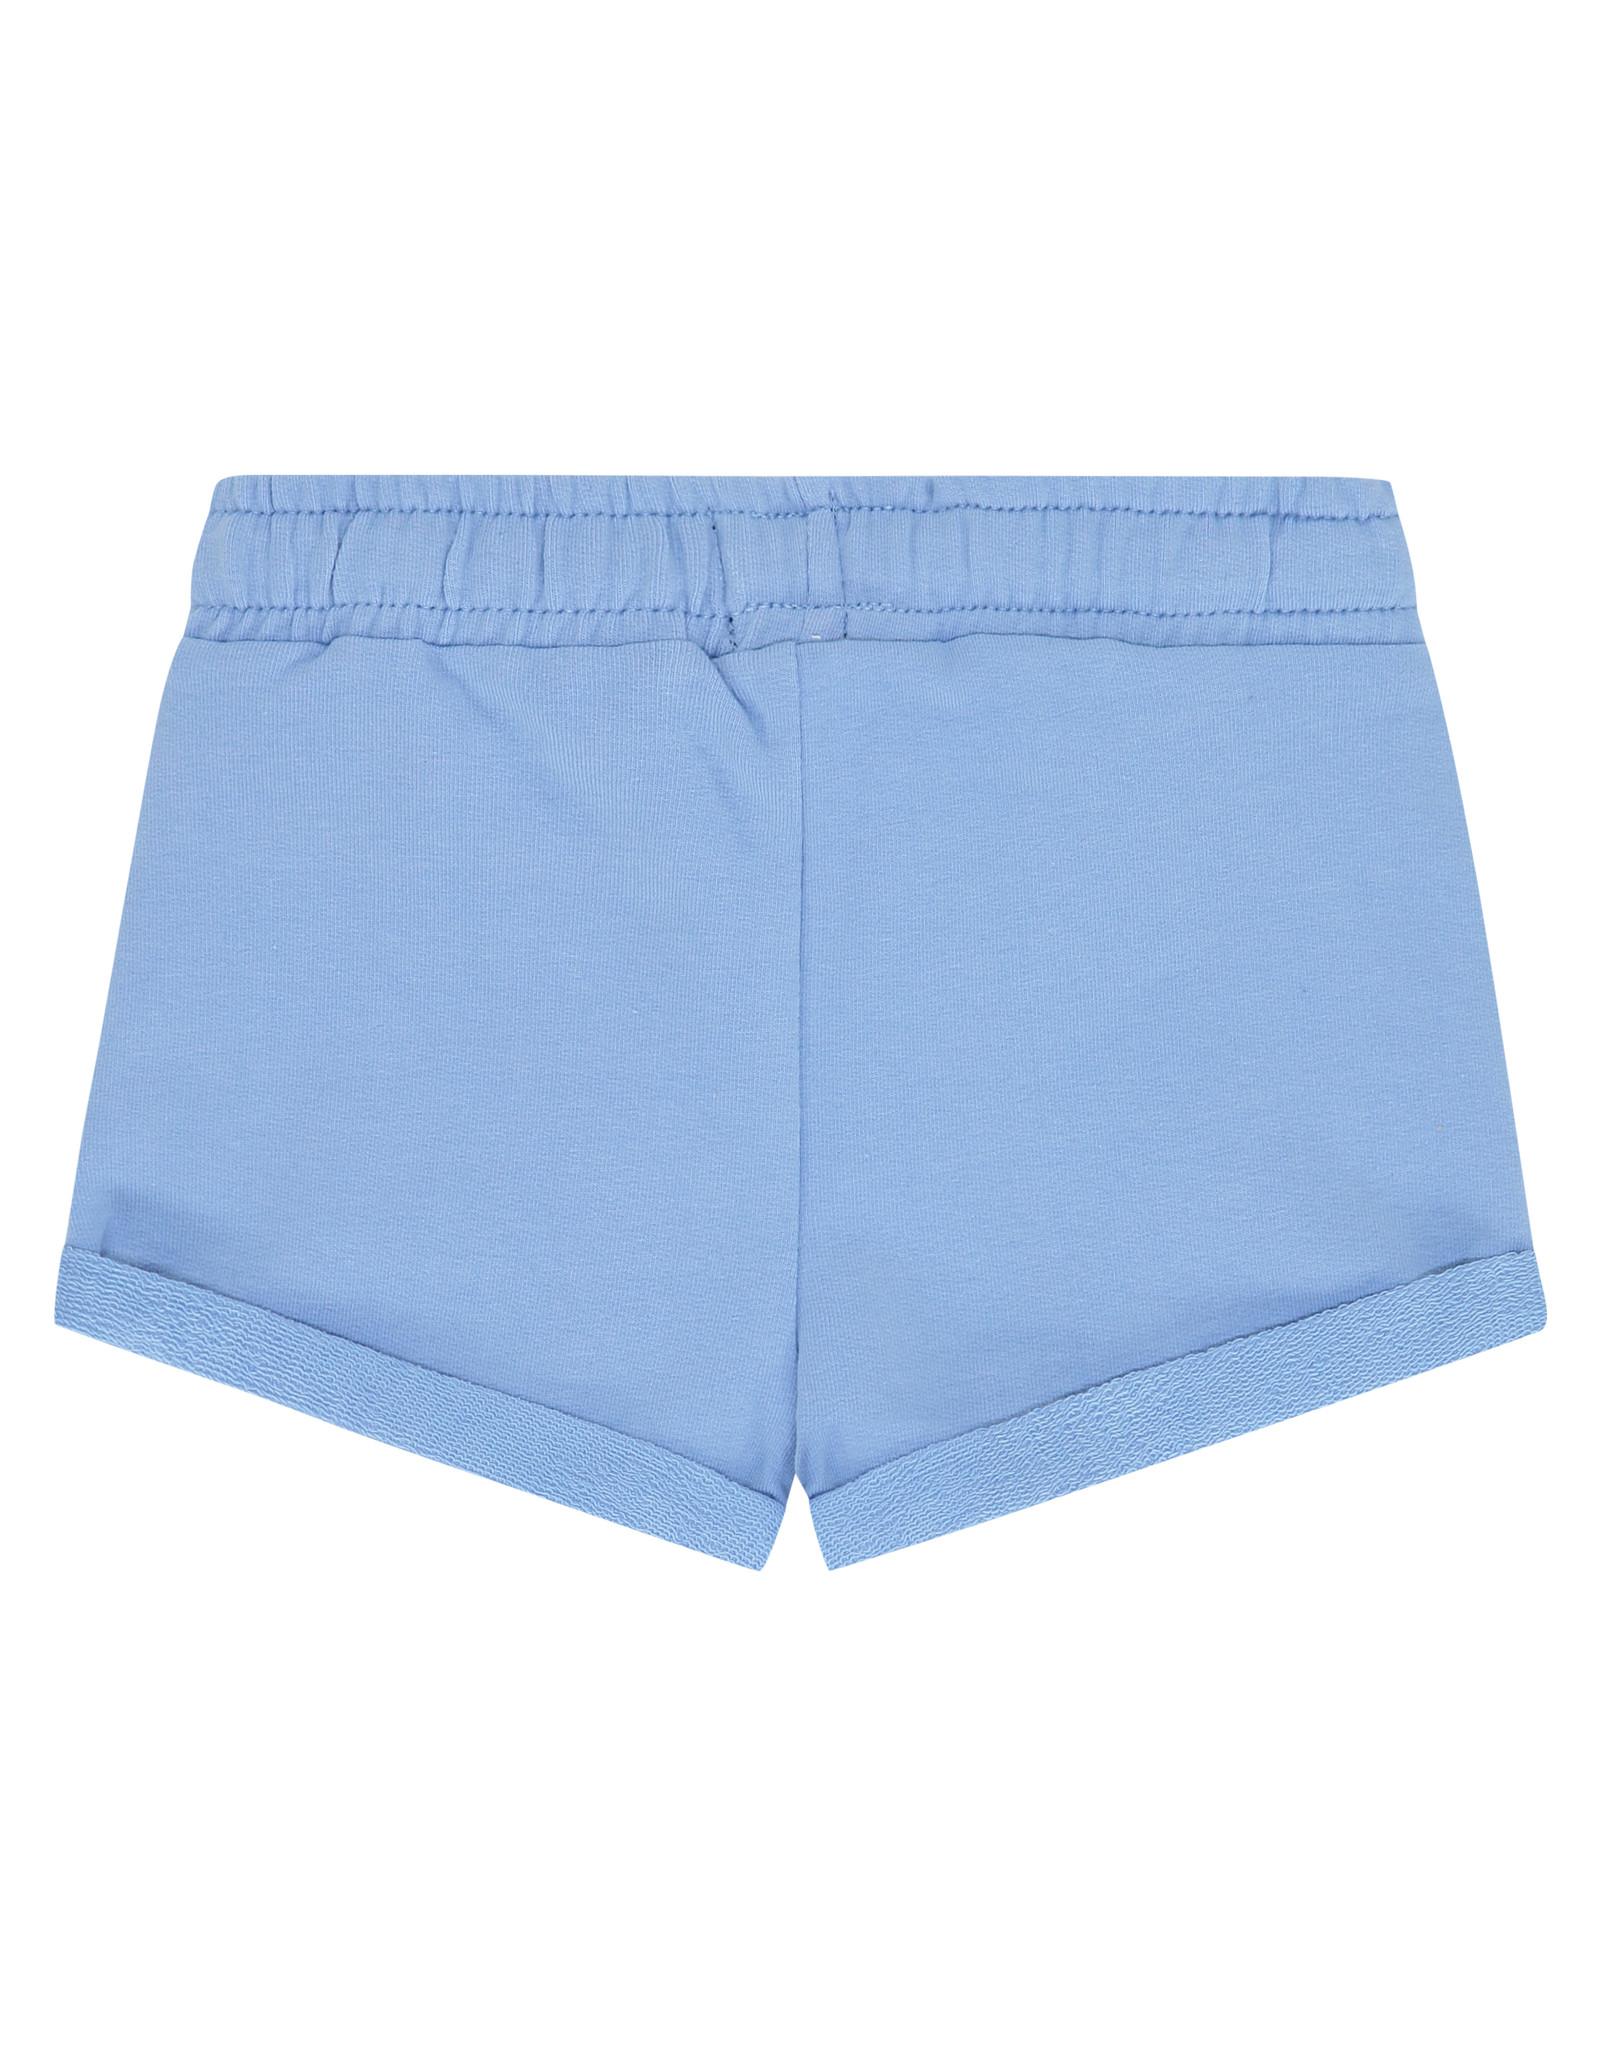 Babyface baby girls short, lavender blue, NWB21228248